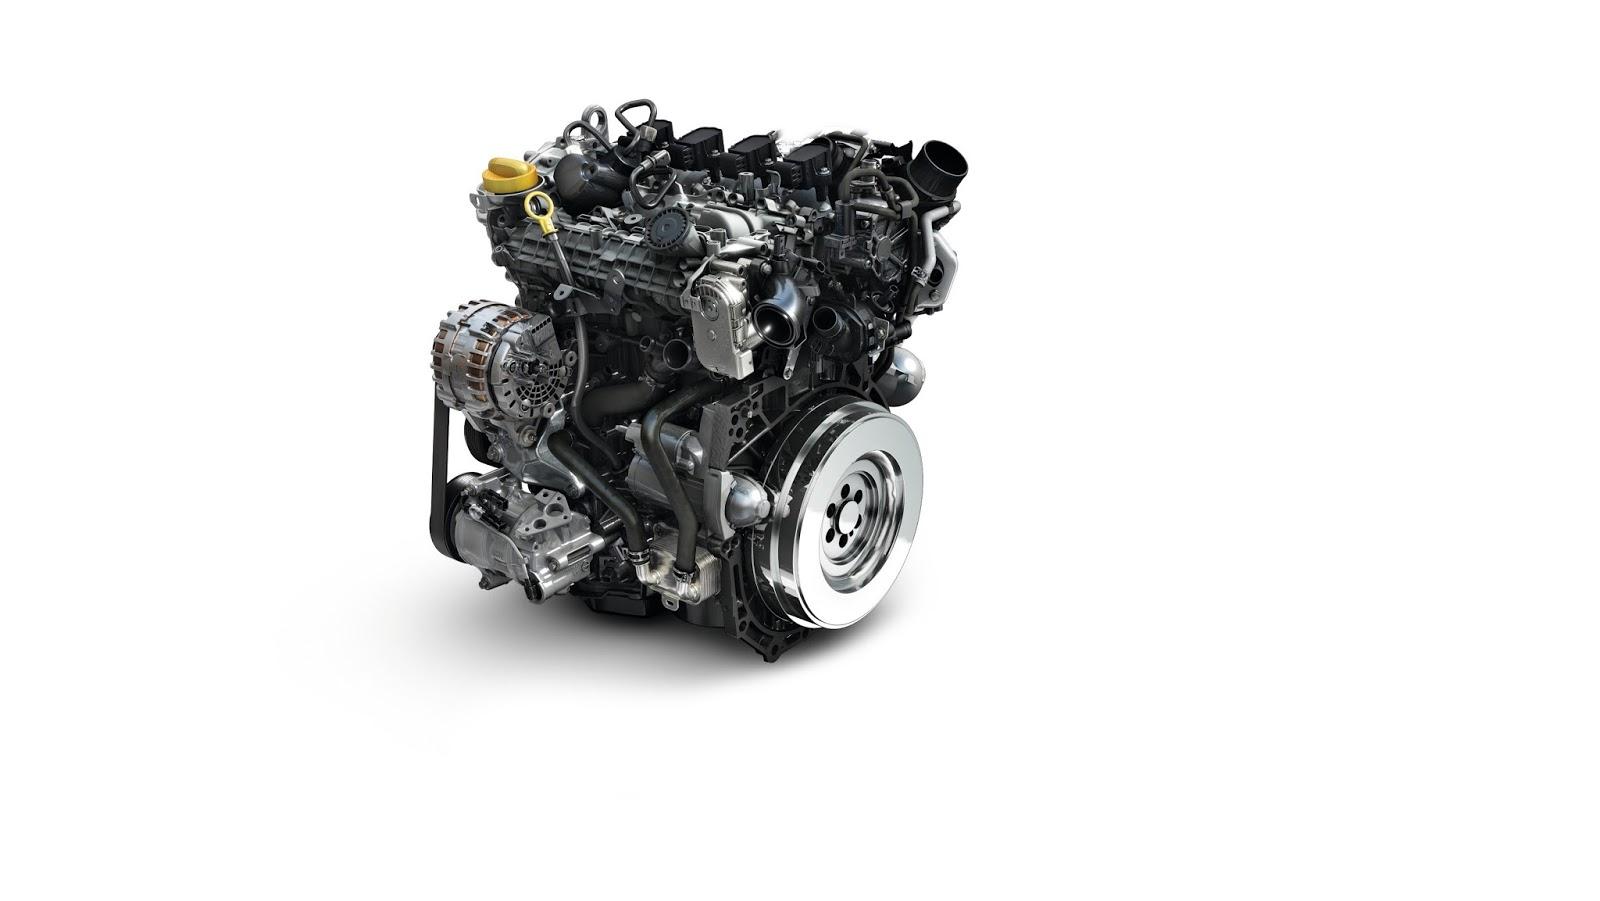 Energy TCe 115 to 160 engine 1,3 lt, ως 160 hp ο νέος κινητήρας της Renault